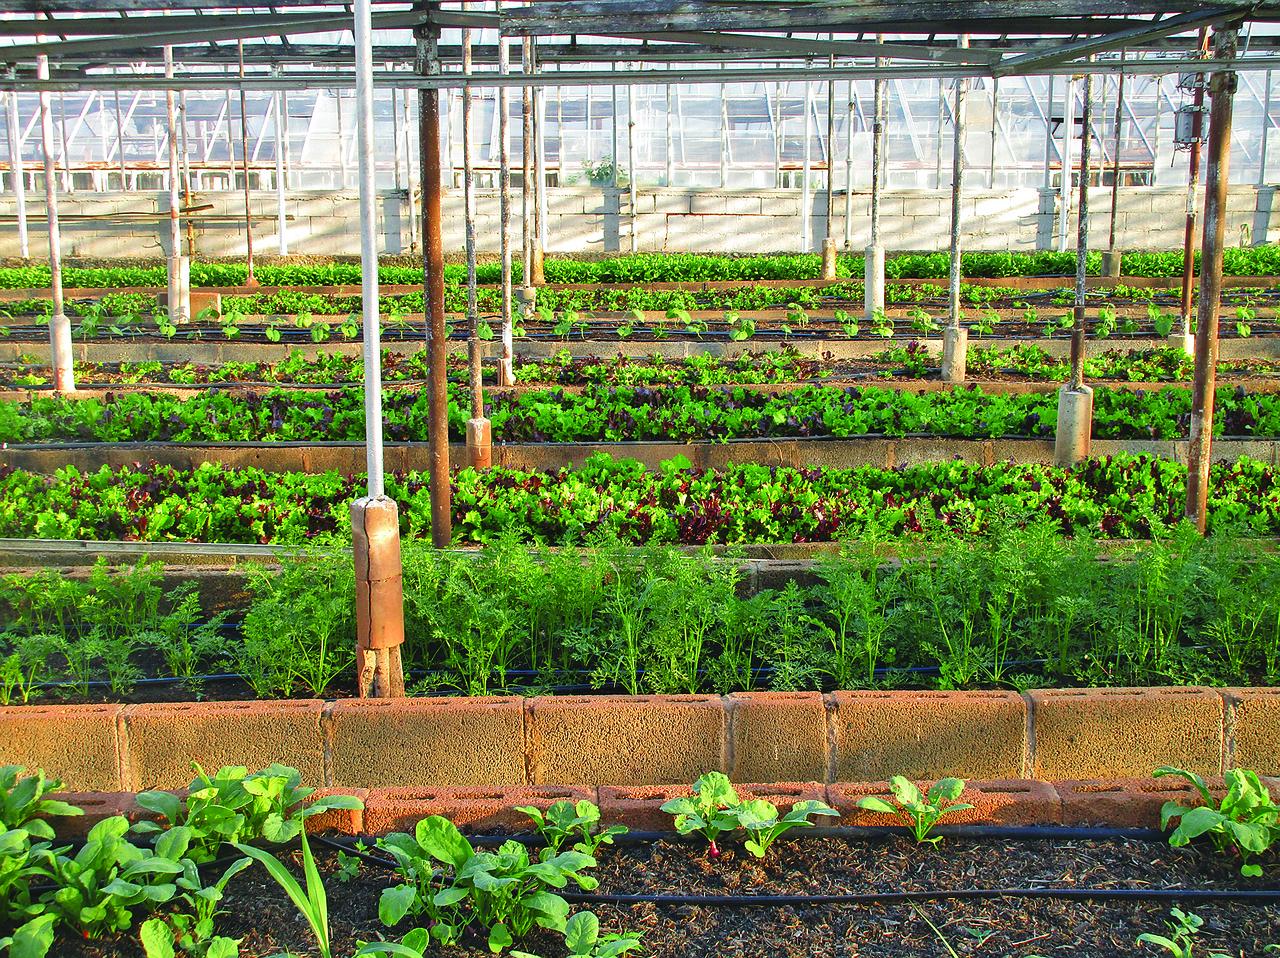 greenhouse-3247181_1280